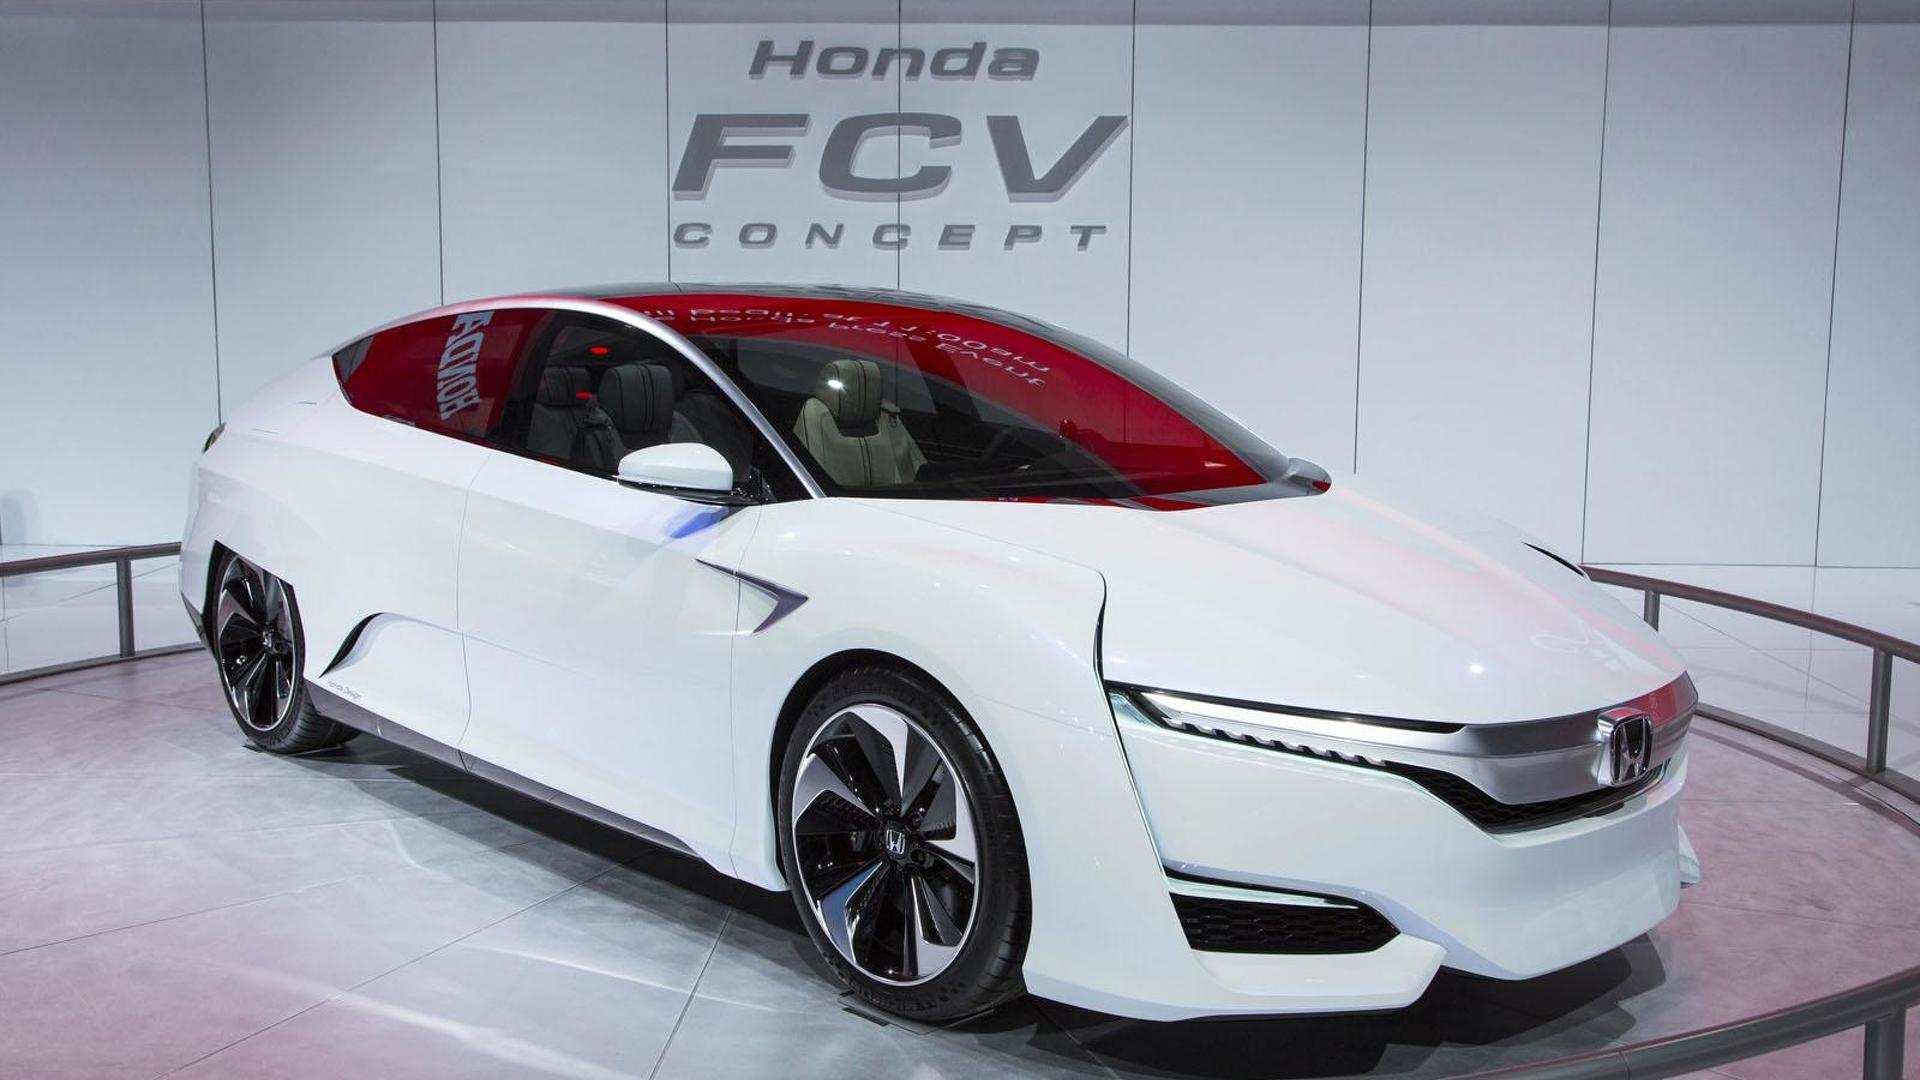 21 Great Honda Vehicles 2020 Images with Honda Vehicles 2020